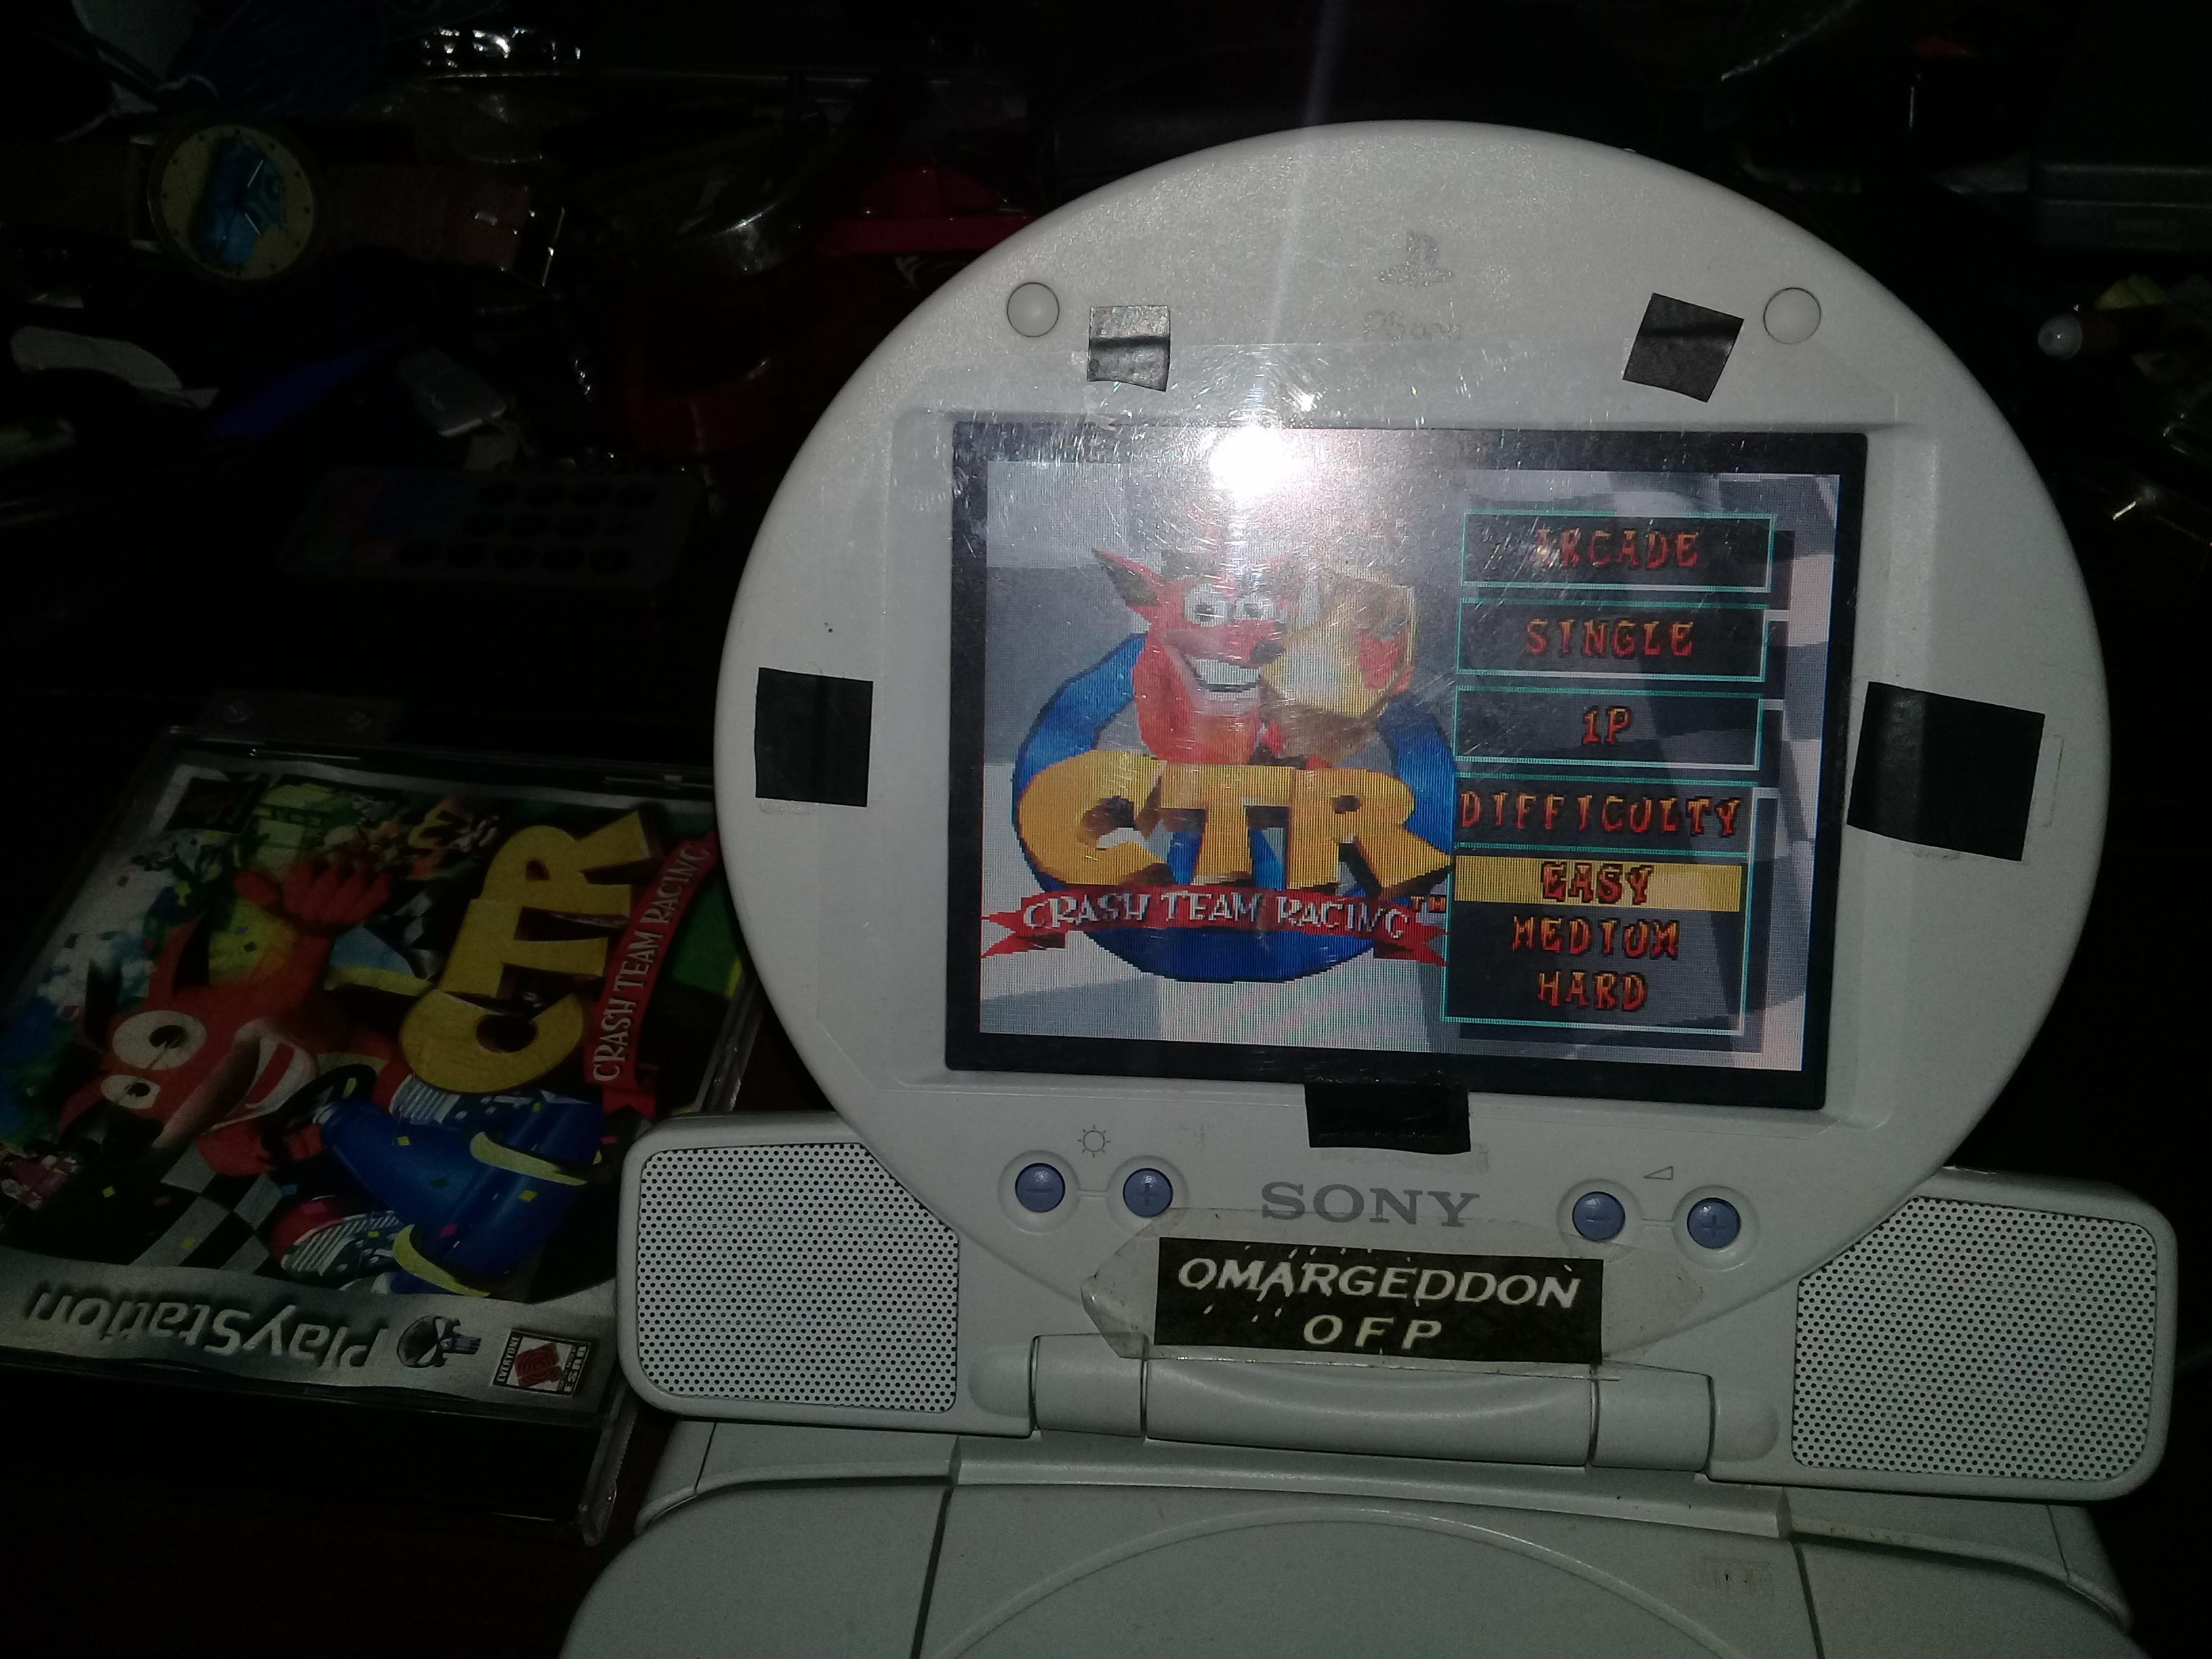 omargeddon: CTR Crash Team Racing: Arcade: Dingo Canyon: Single: Easy [Best Lap] (Playstation 1) 0:00:36.03 points on 2019-07-01 13:23:23